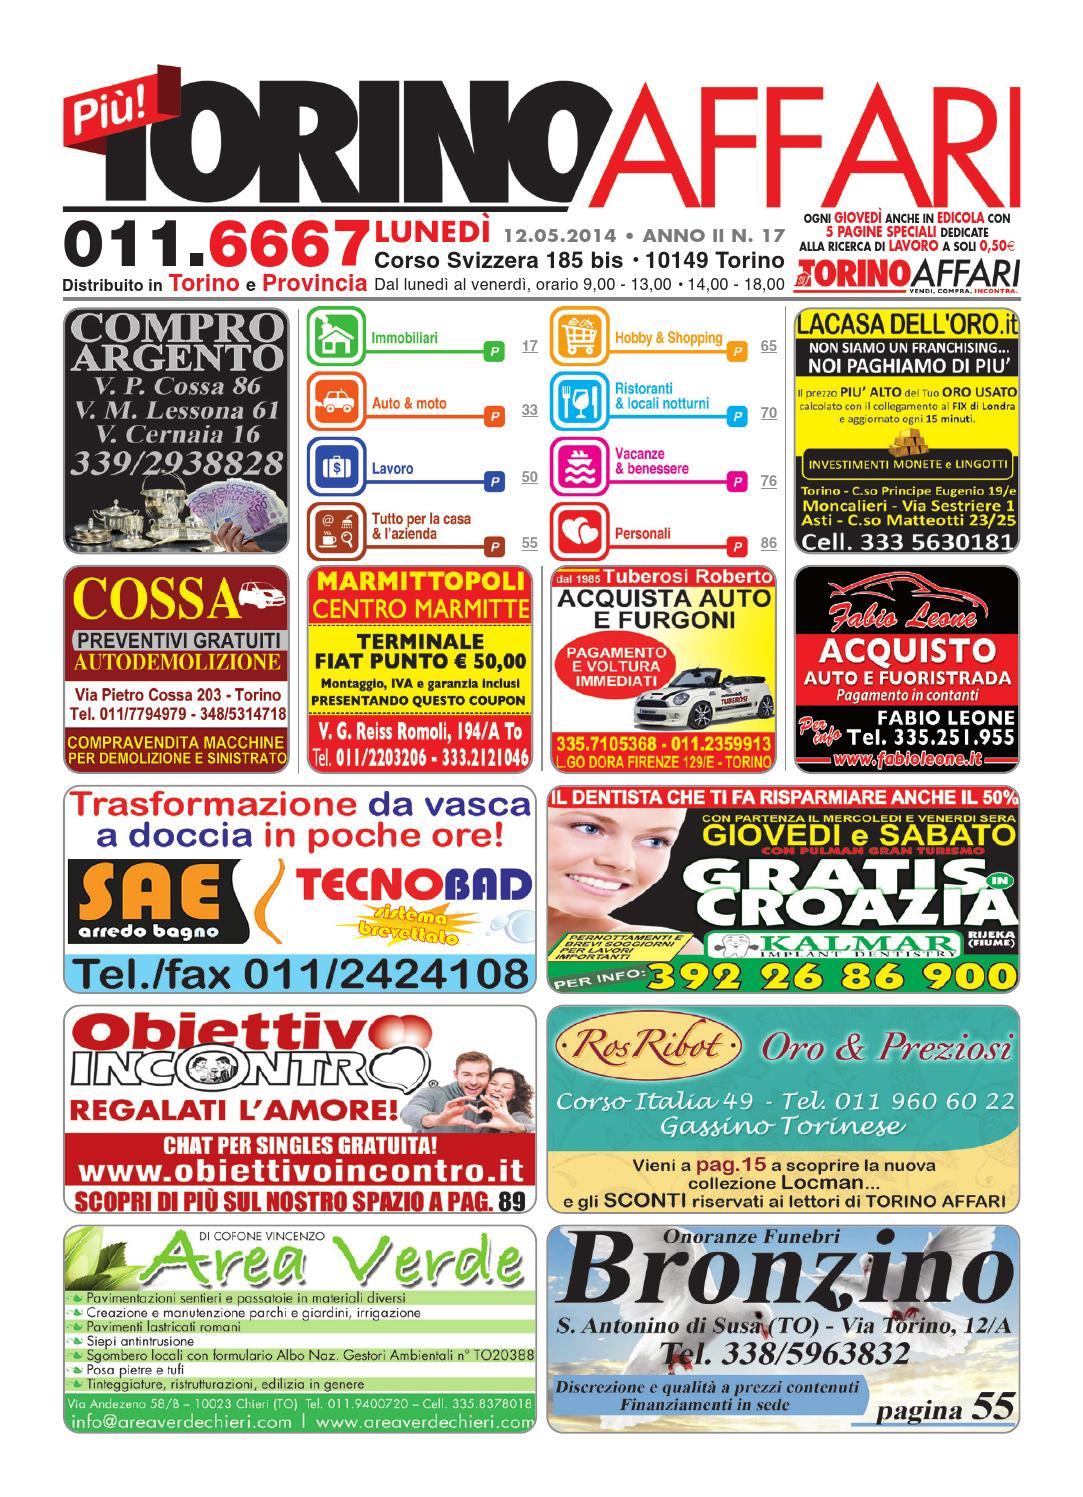 Sae Arredo Bagno Torino.Piu Torino Affari Ed Free 17 Del 12 05 2014 By Torino Affari Issuu